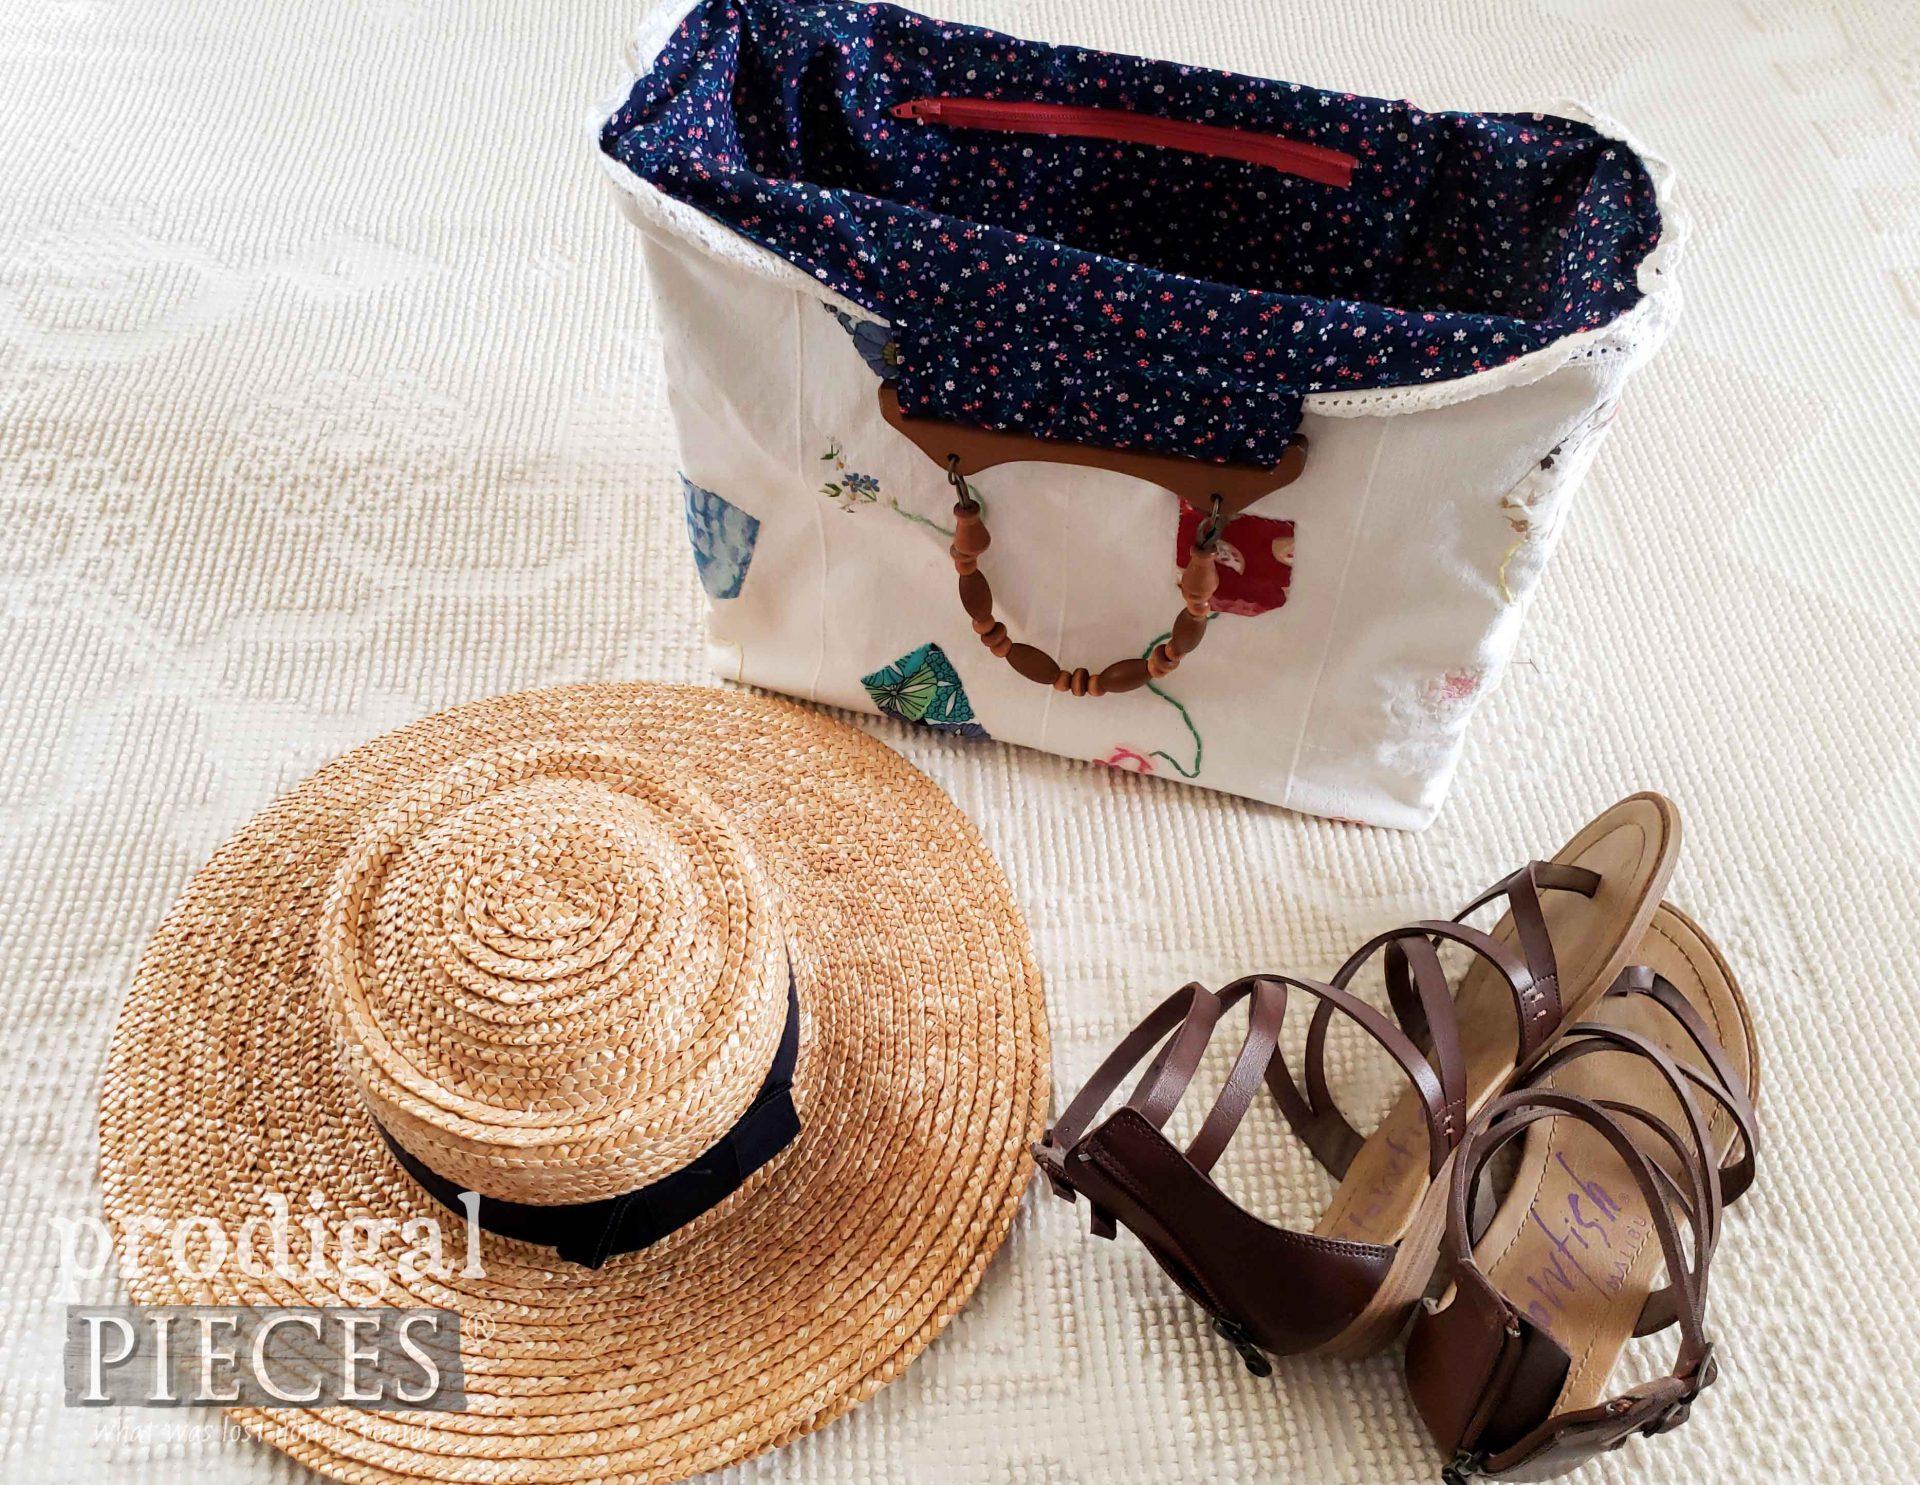 Simple Handmade Tote Bag by Larissa of Prodigal Pieces | prodigalpieces.com #prodigalpieces #bag #fashion #handmade #ladies #style